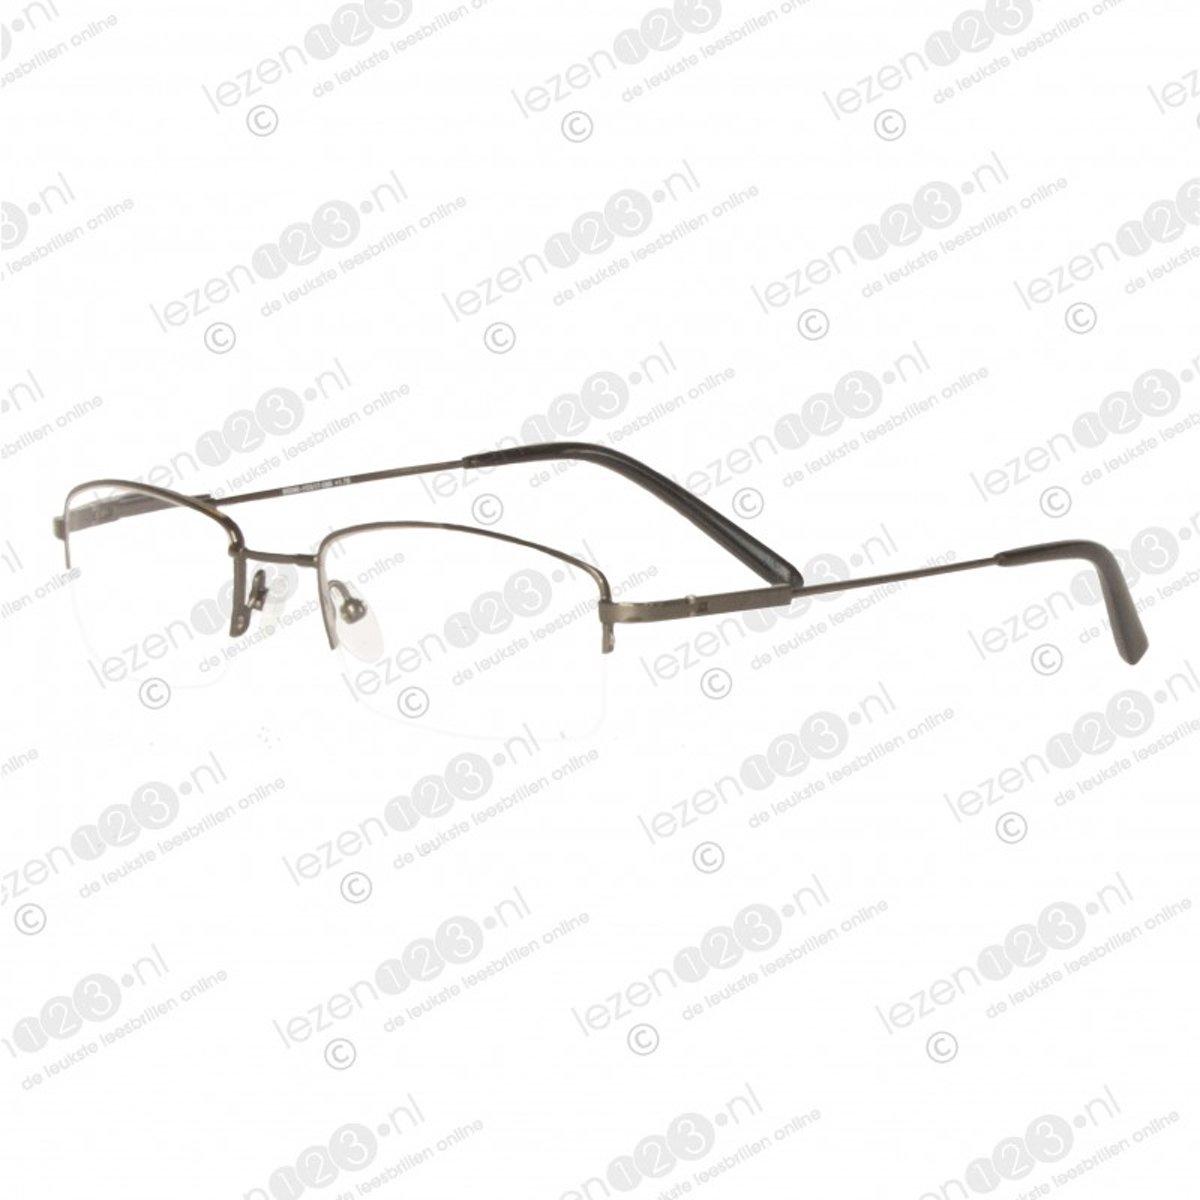 Icon Eyewear FCH407 Premium Leesbril +1.50 - Memory metal - Antraciet kopen